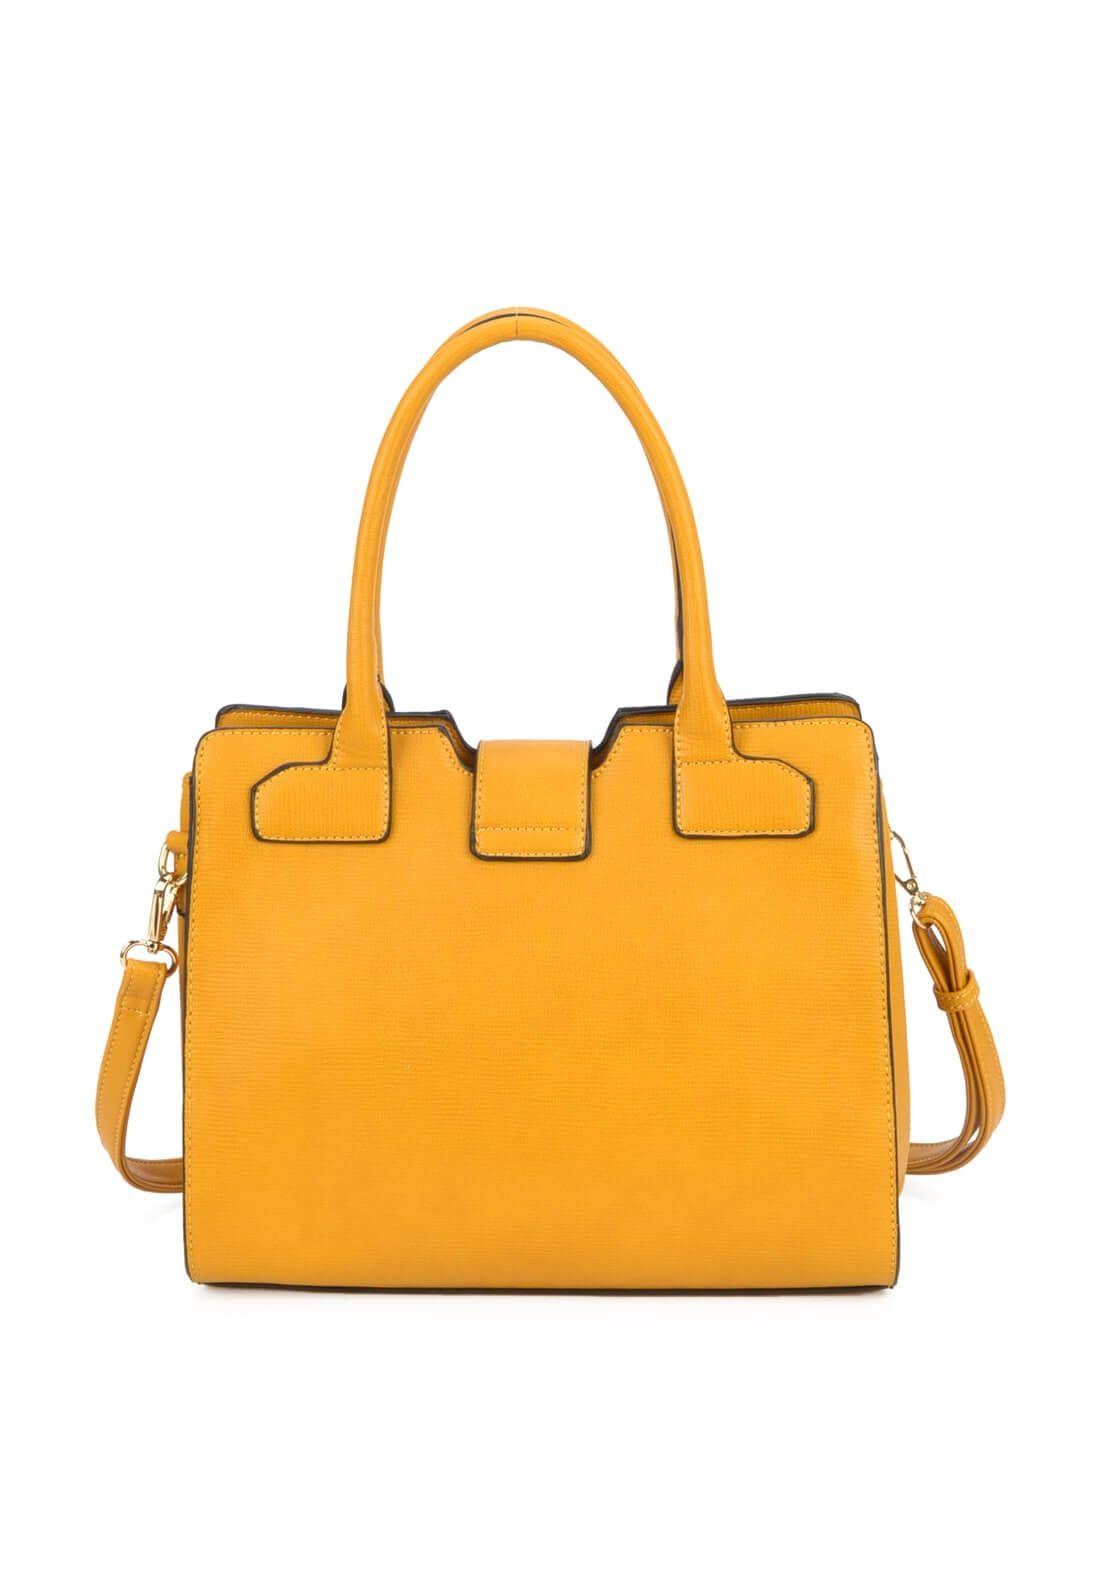 Bolsa Feminina Amarelo Mostarda Rígida Gash Original